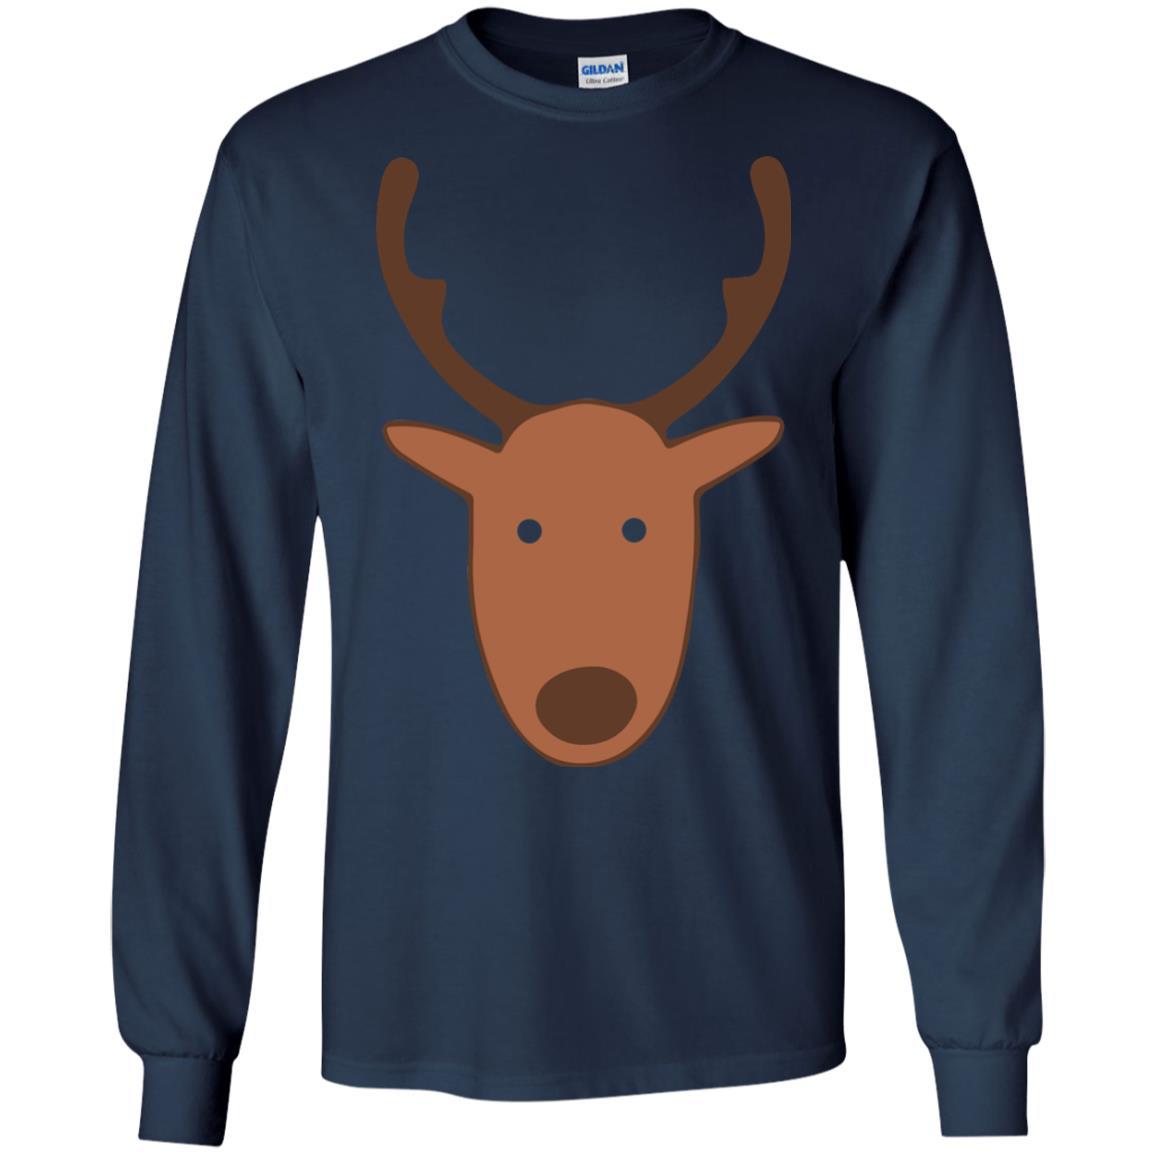 image 4768 - Tina Belcher Reindeer Christmas Sweater, Shirt, Hoodie